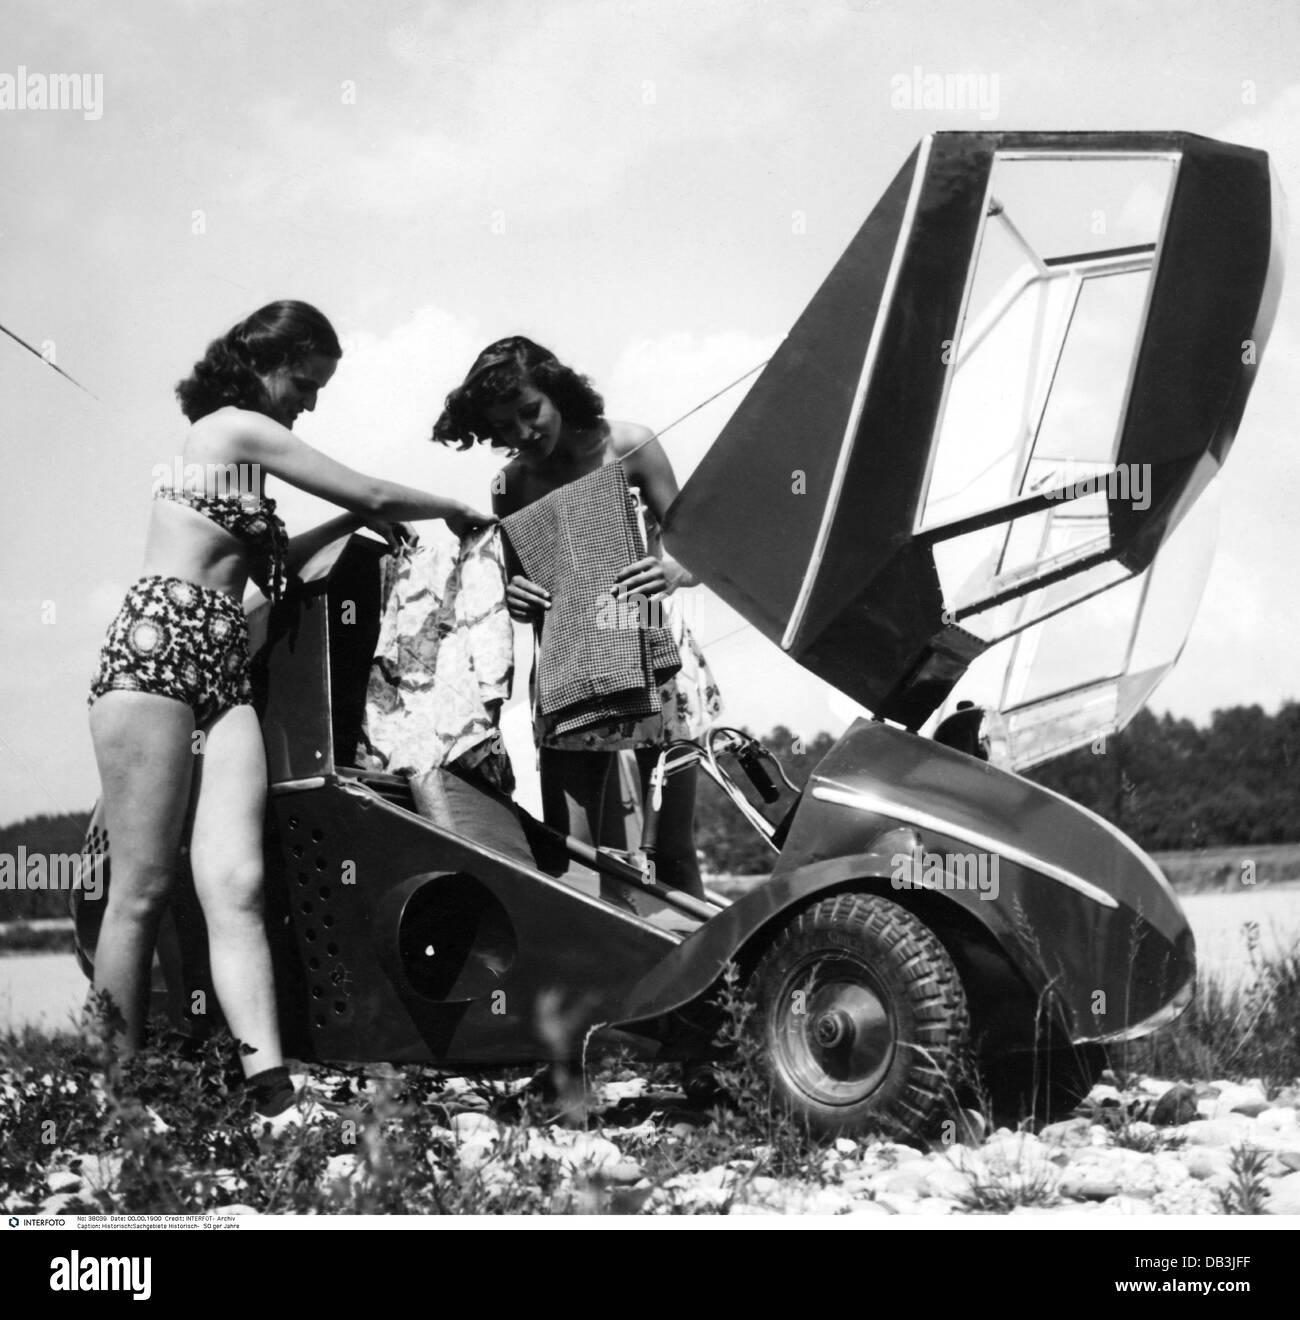 Flitzer Stockfotos & Flitzer Bilder - Alamy